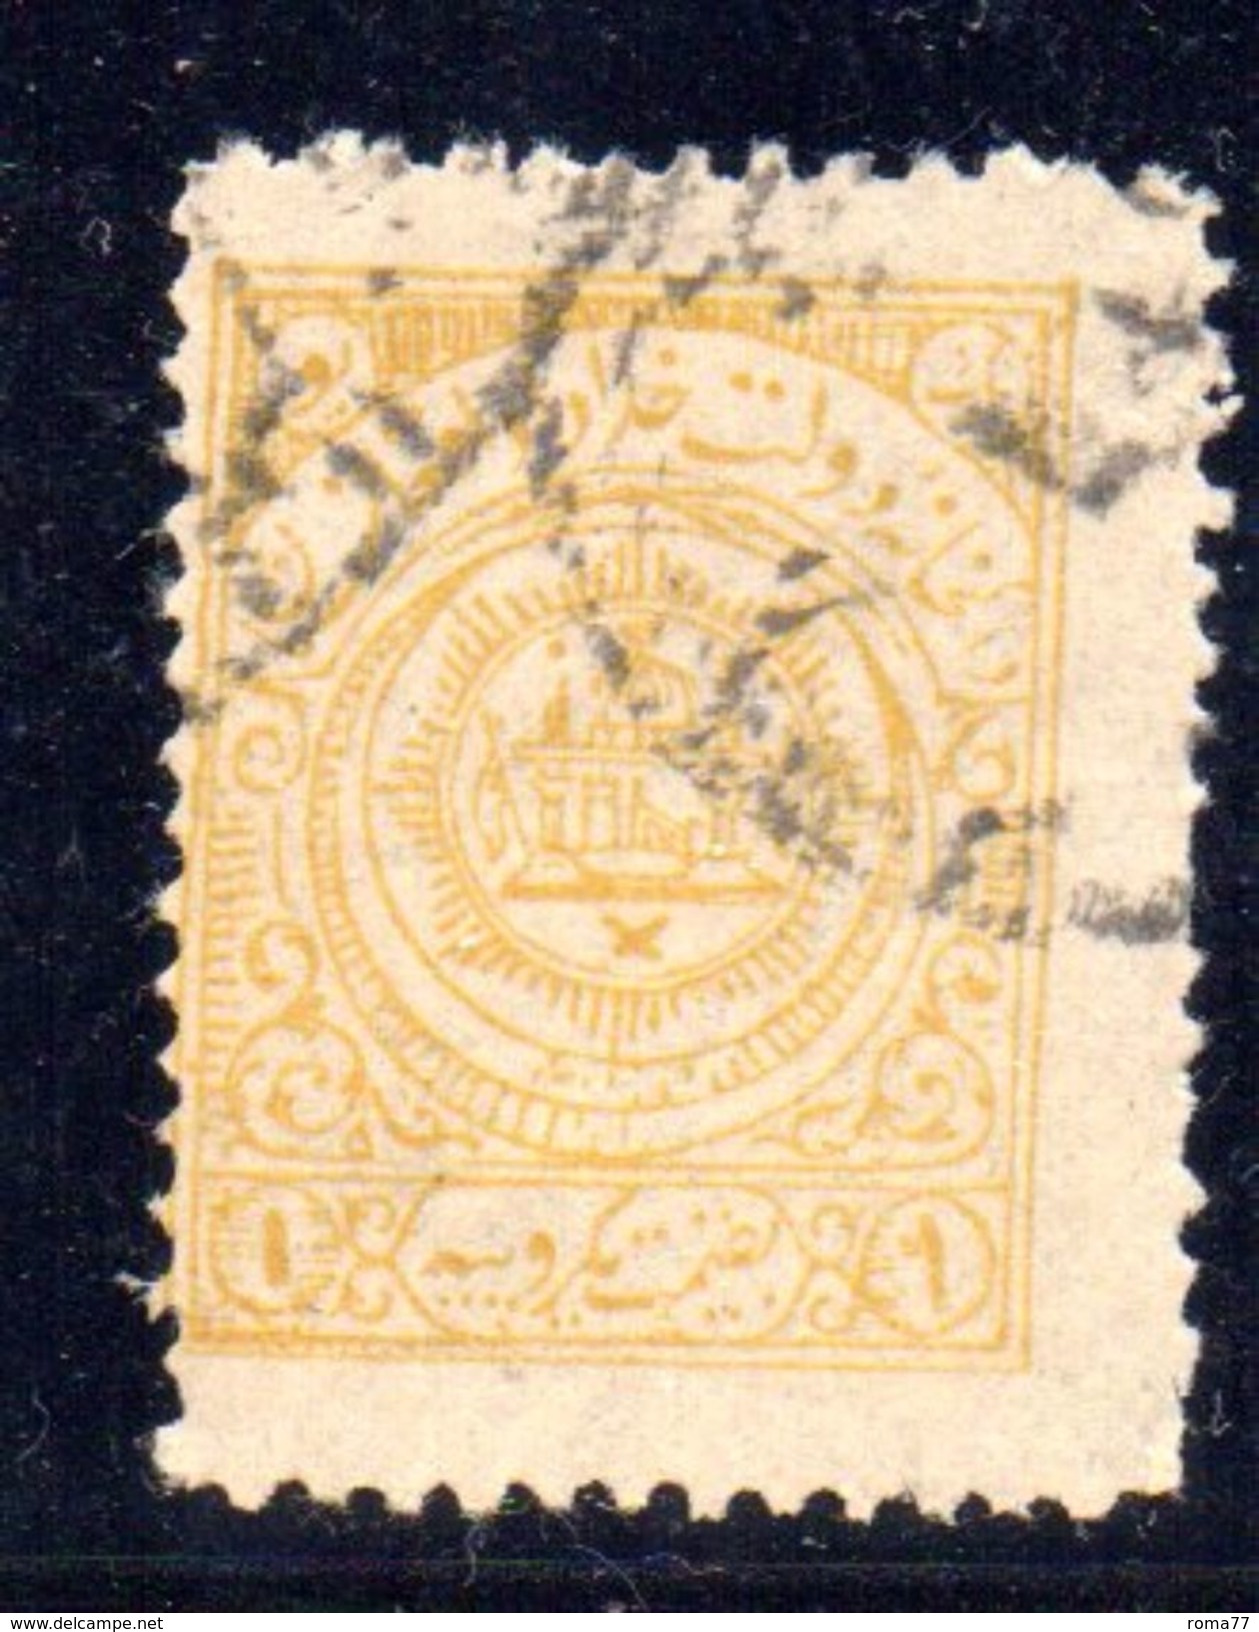 XP2886 - AFGANISTAN , 1 Valore Giallo Oliva Usato . - Afghanistan